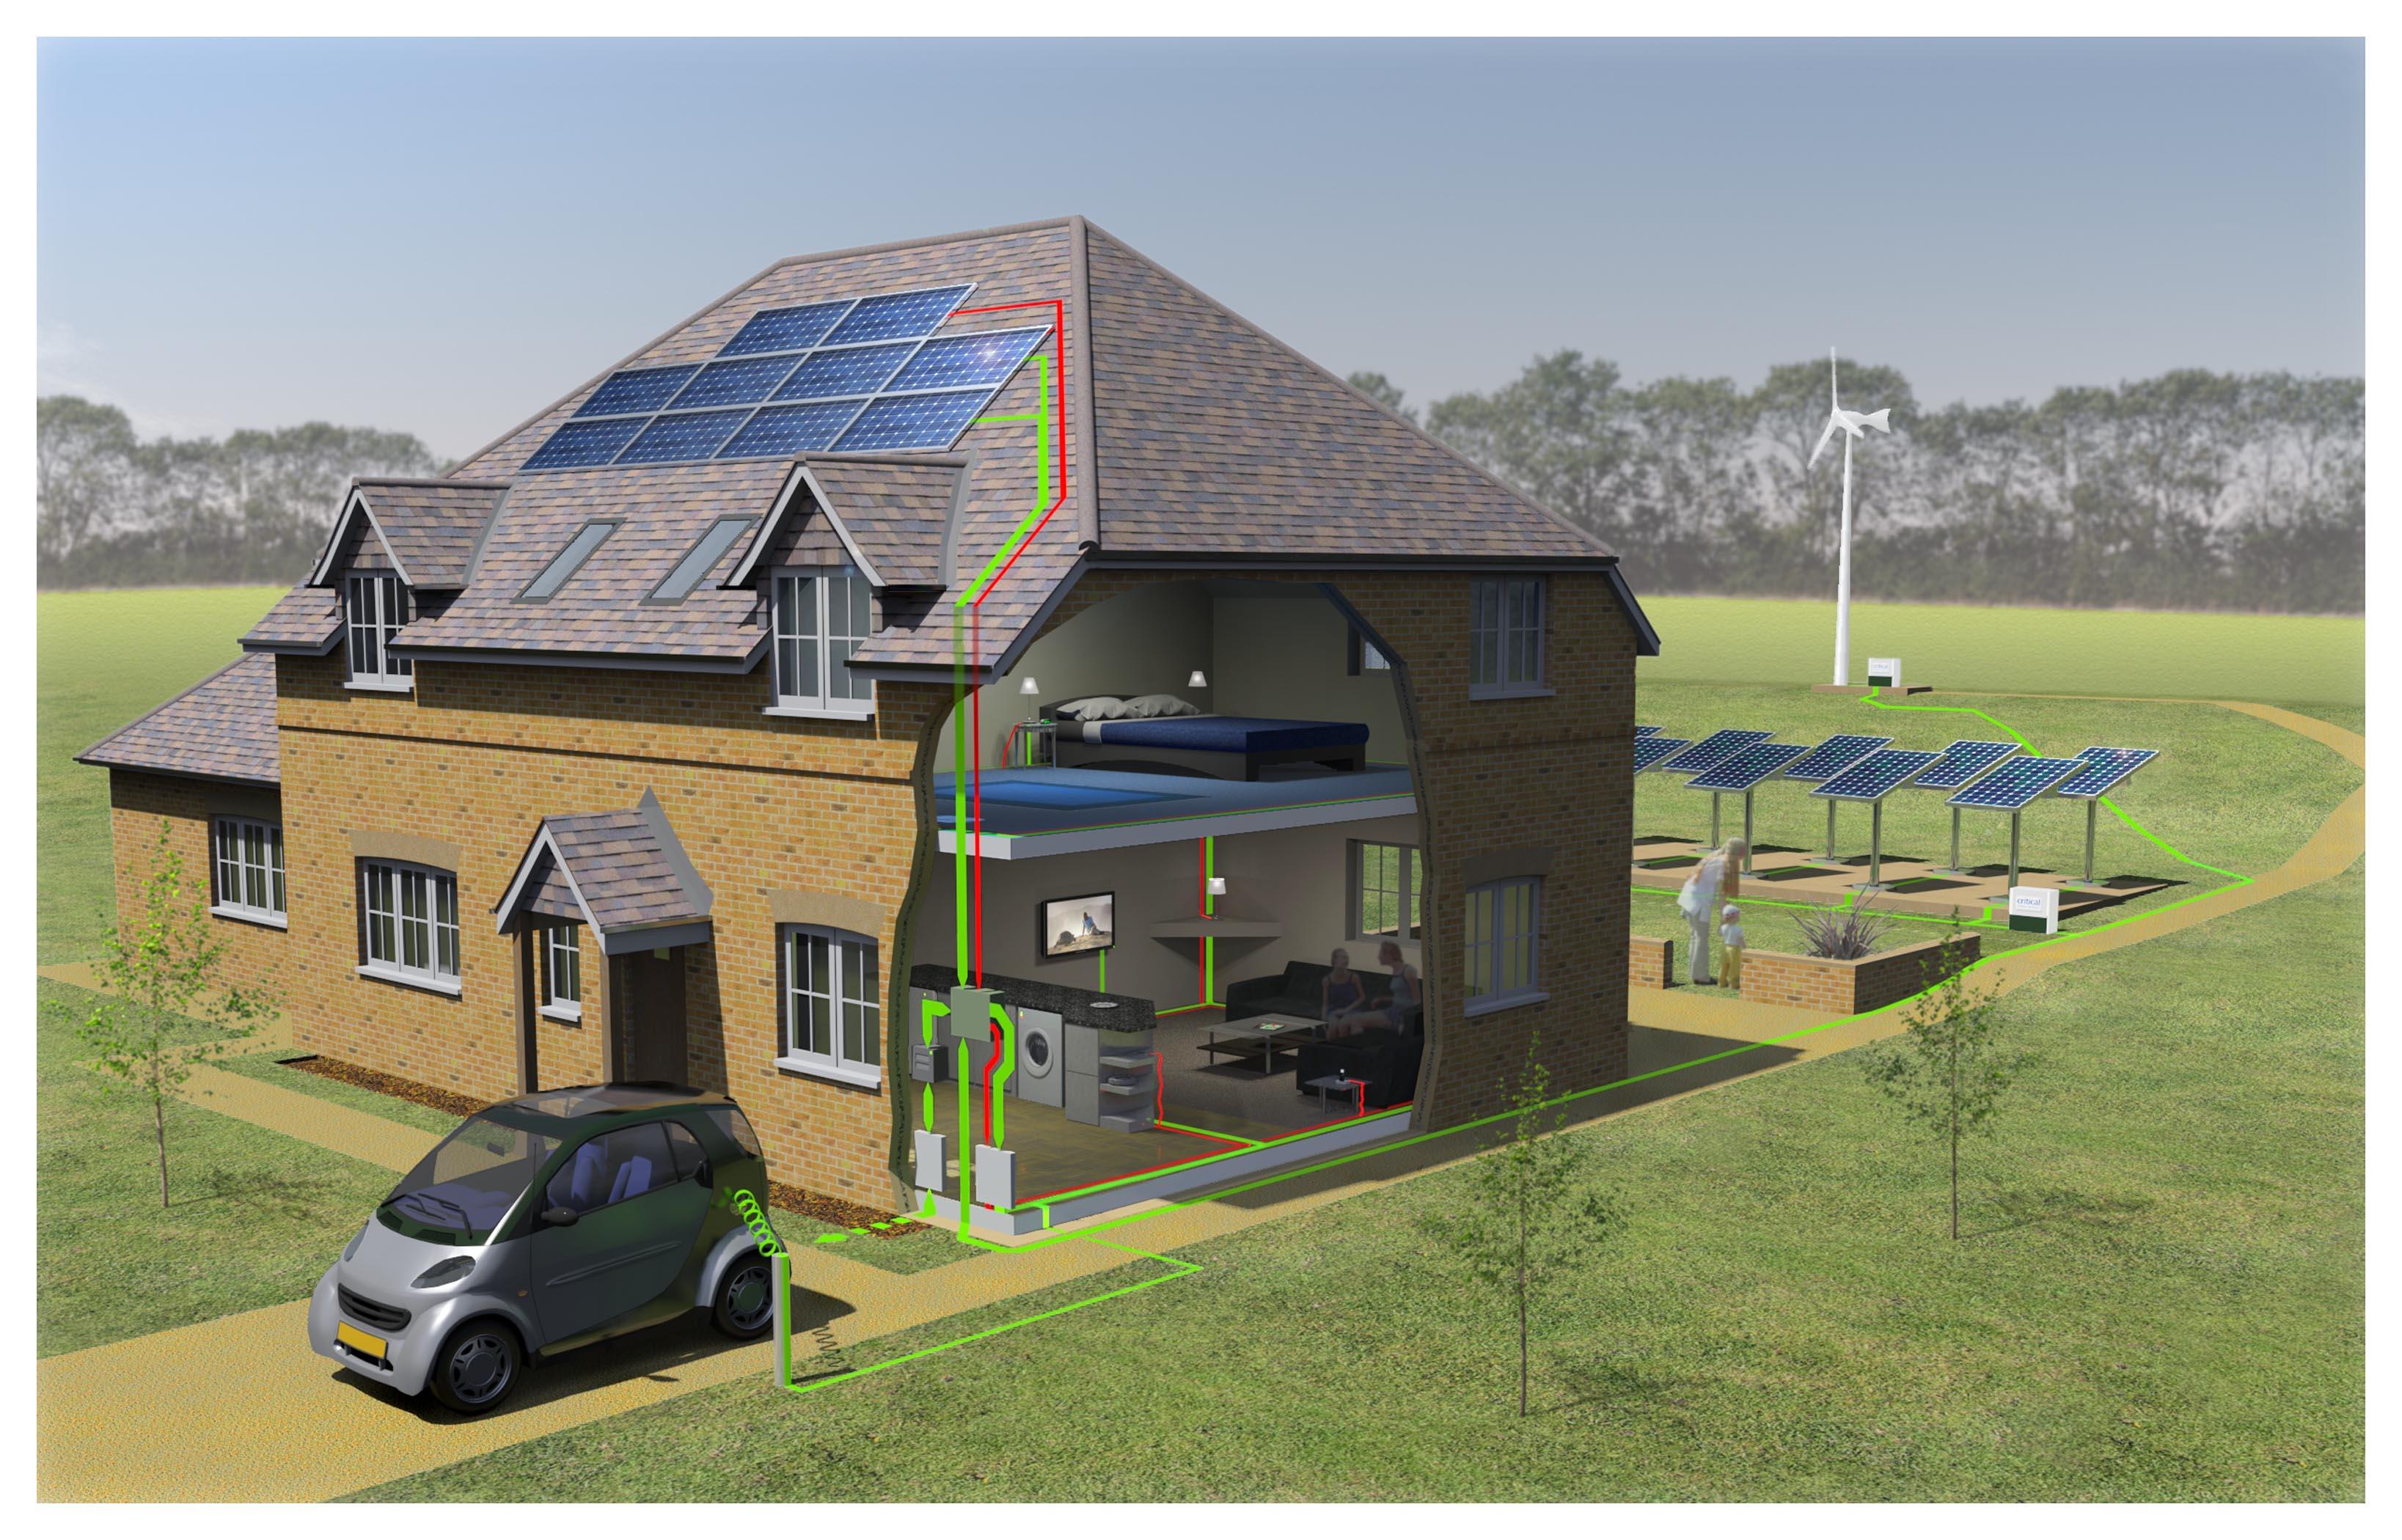 Eco House Bolton photo - 8